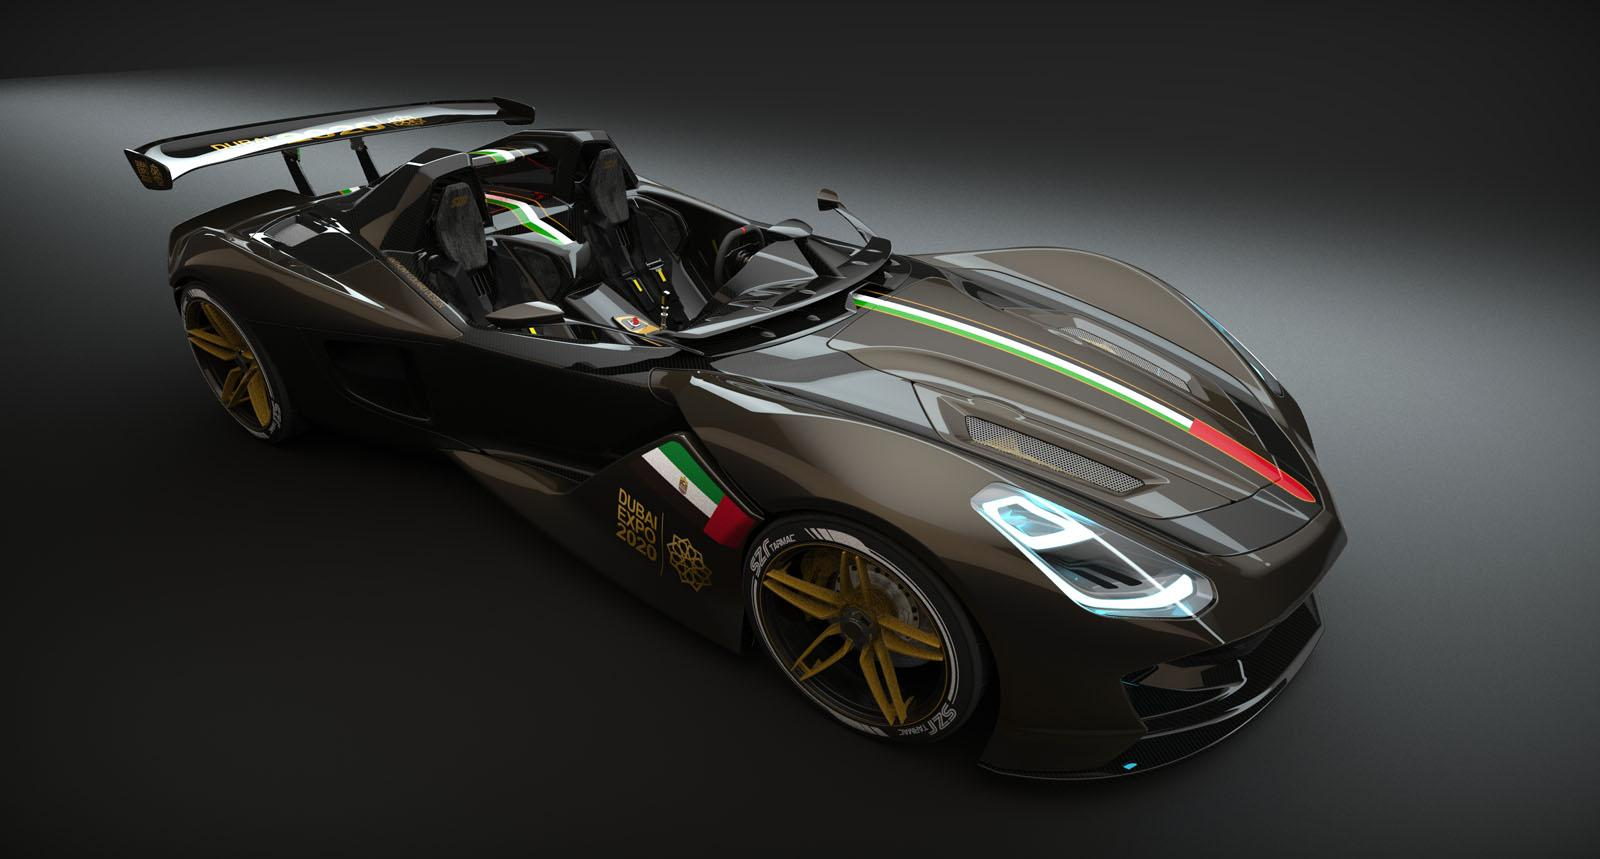 Inferno Exotic Car 2017 >> Dubai Roadster Sports Car Imagined - GTspirit